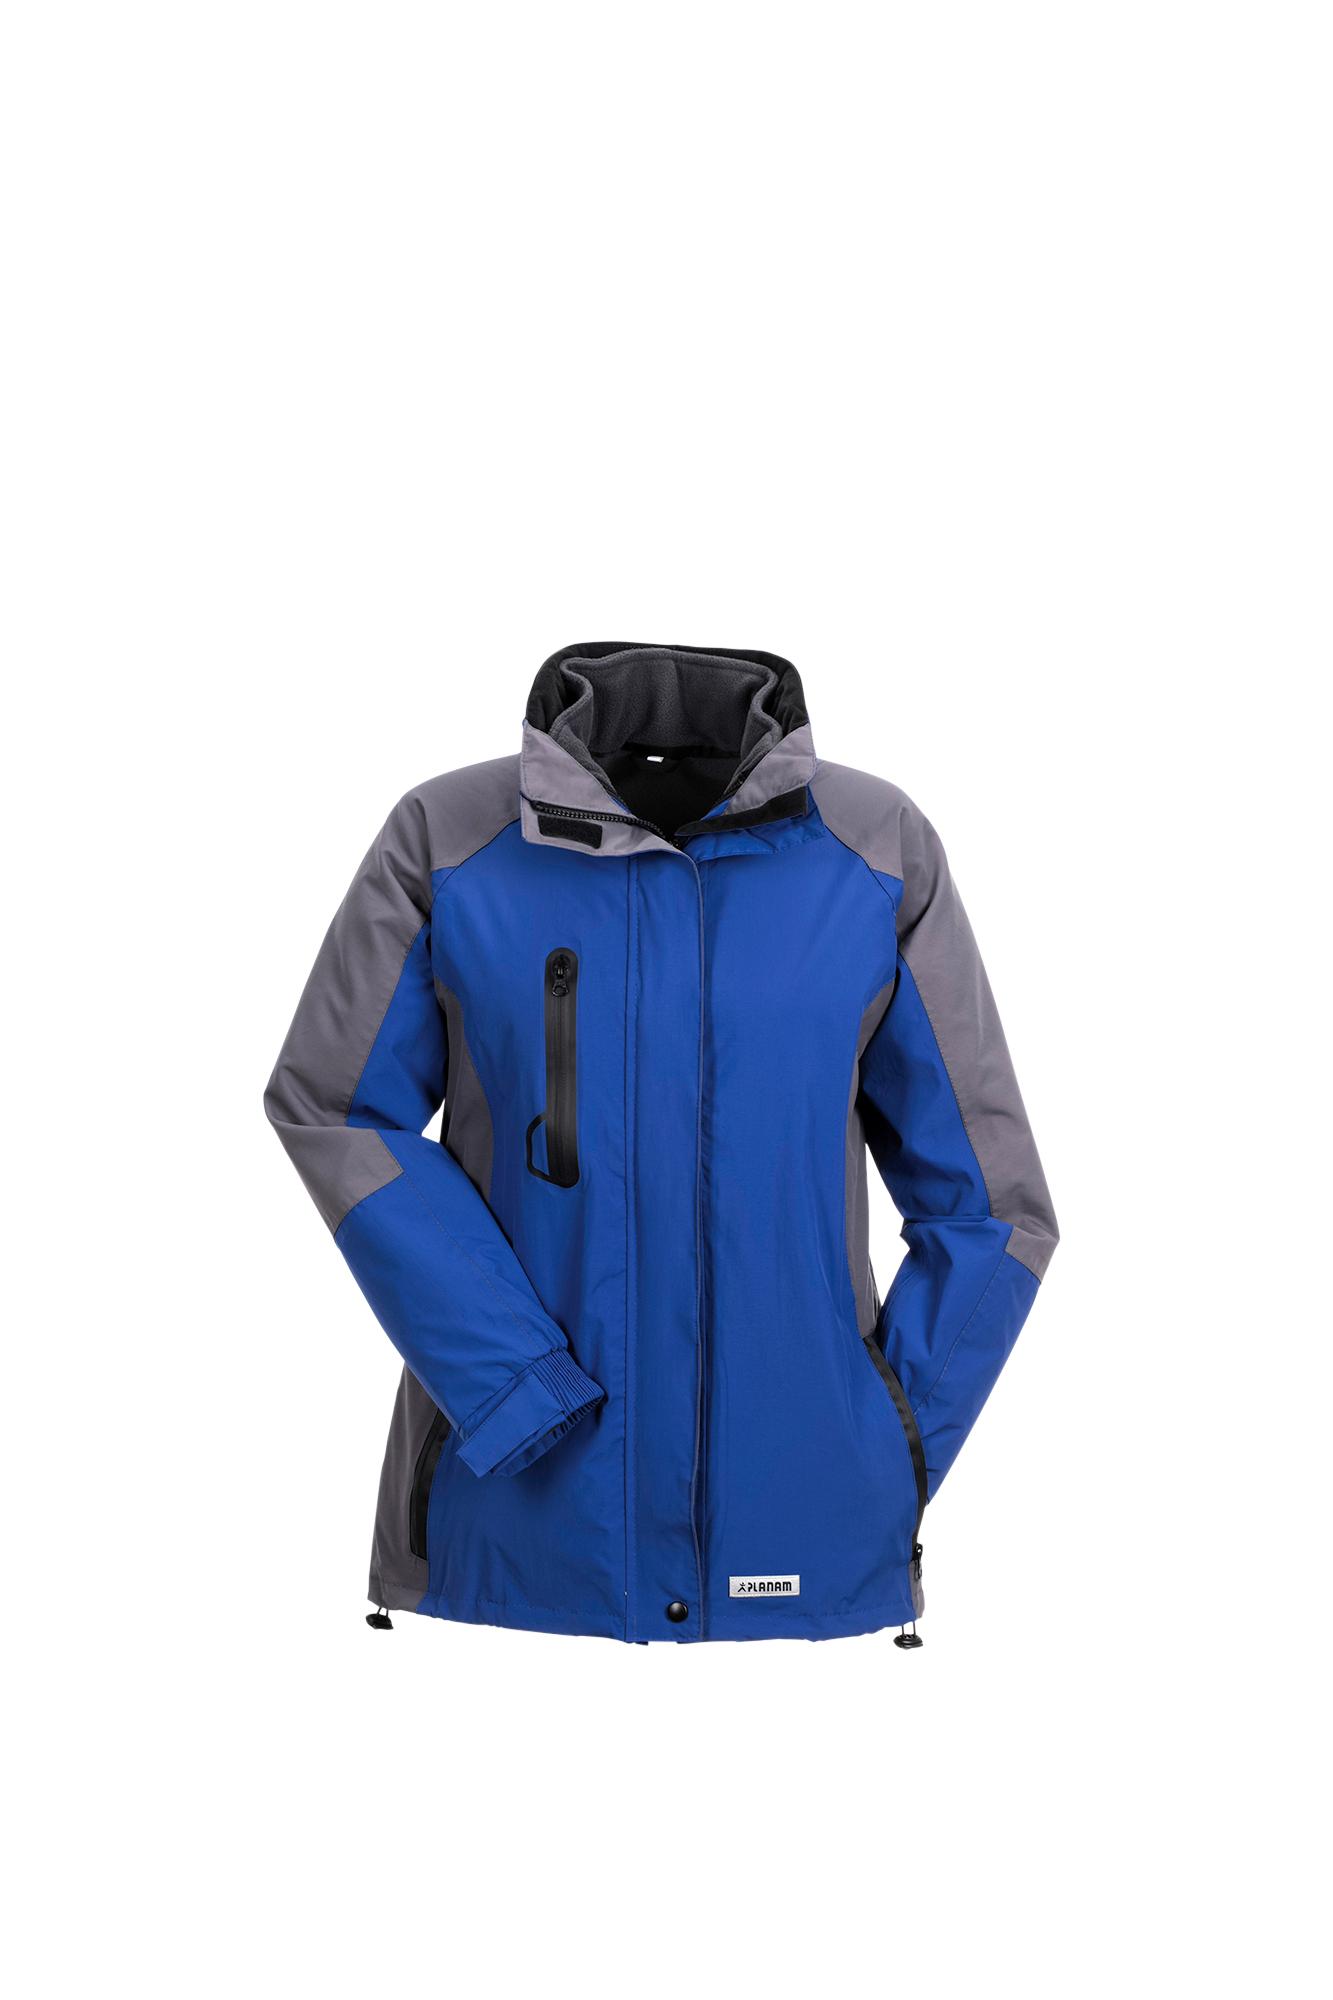 SAHLBERG Online-Shop: Shape Damen Winterjacke, blau/grau